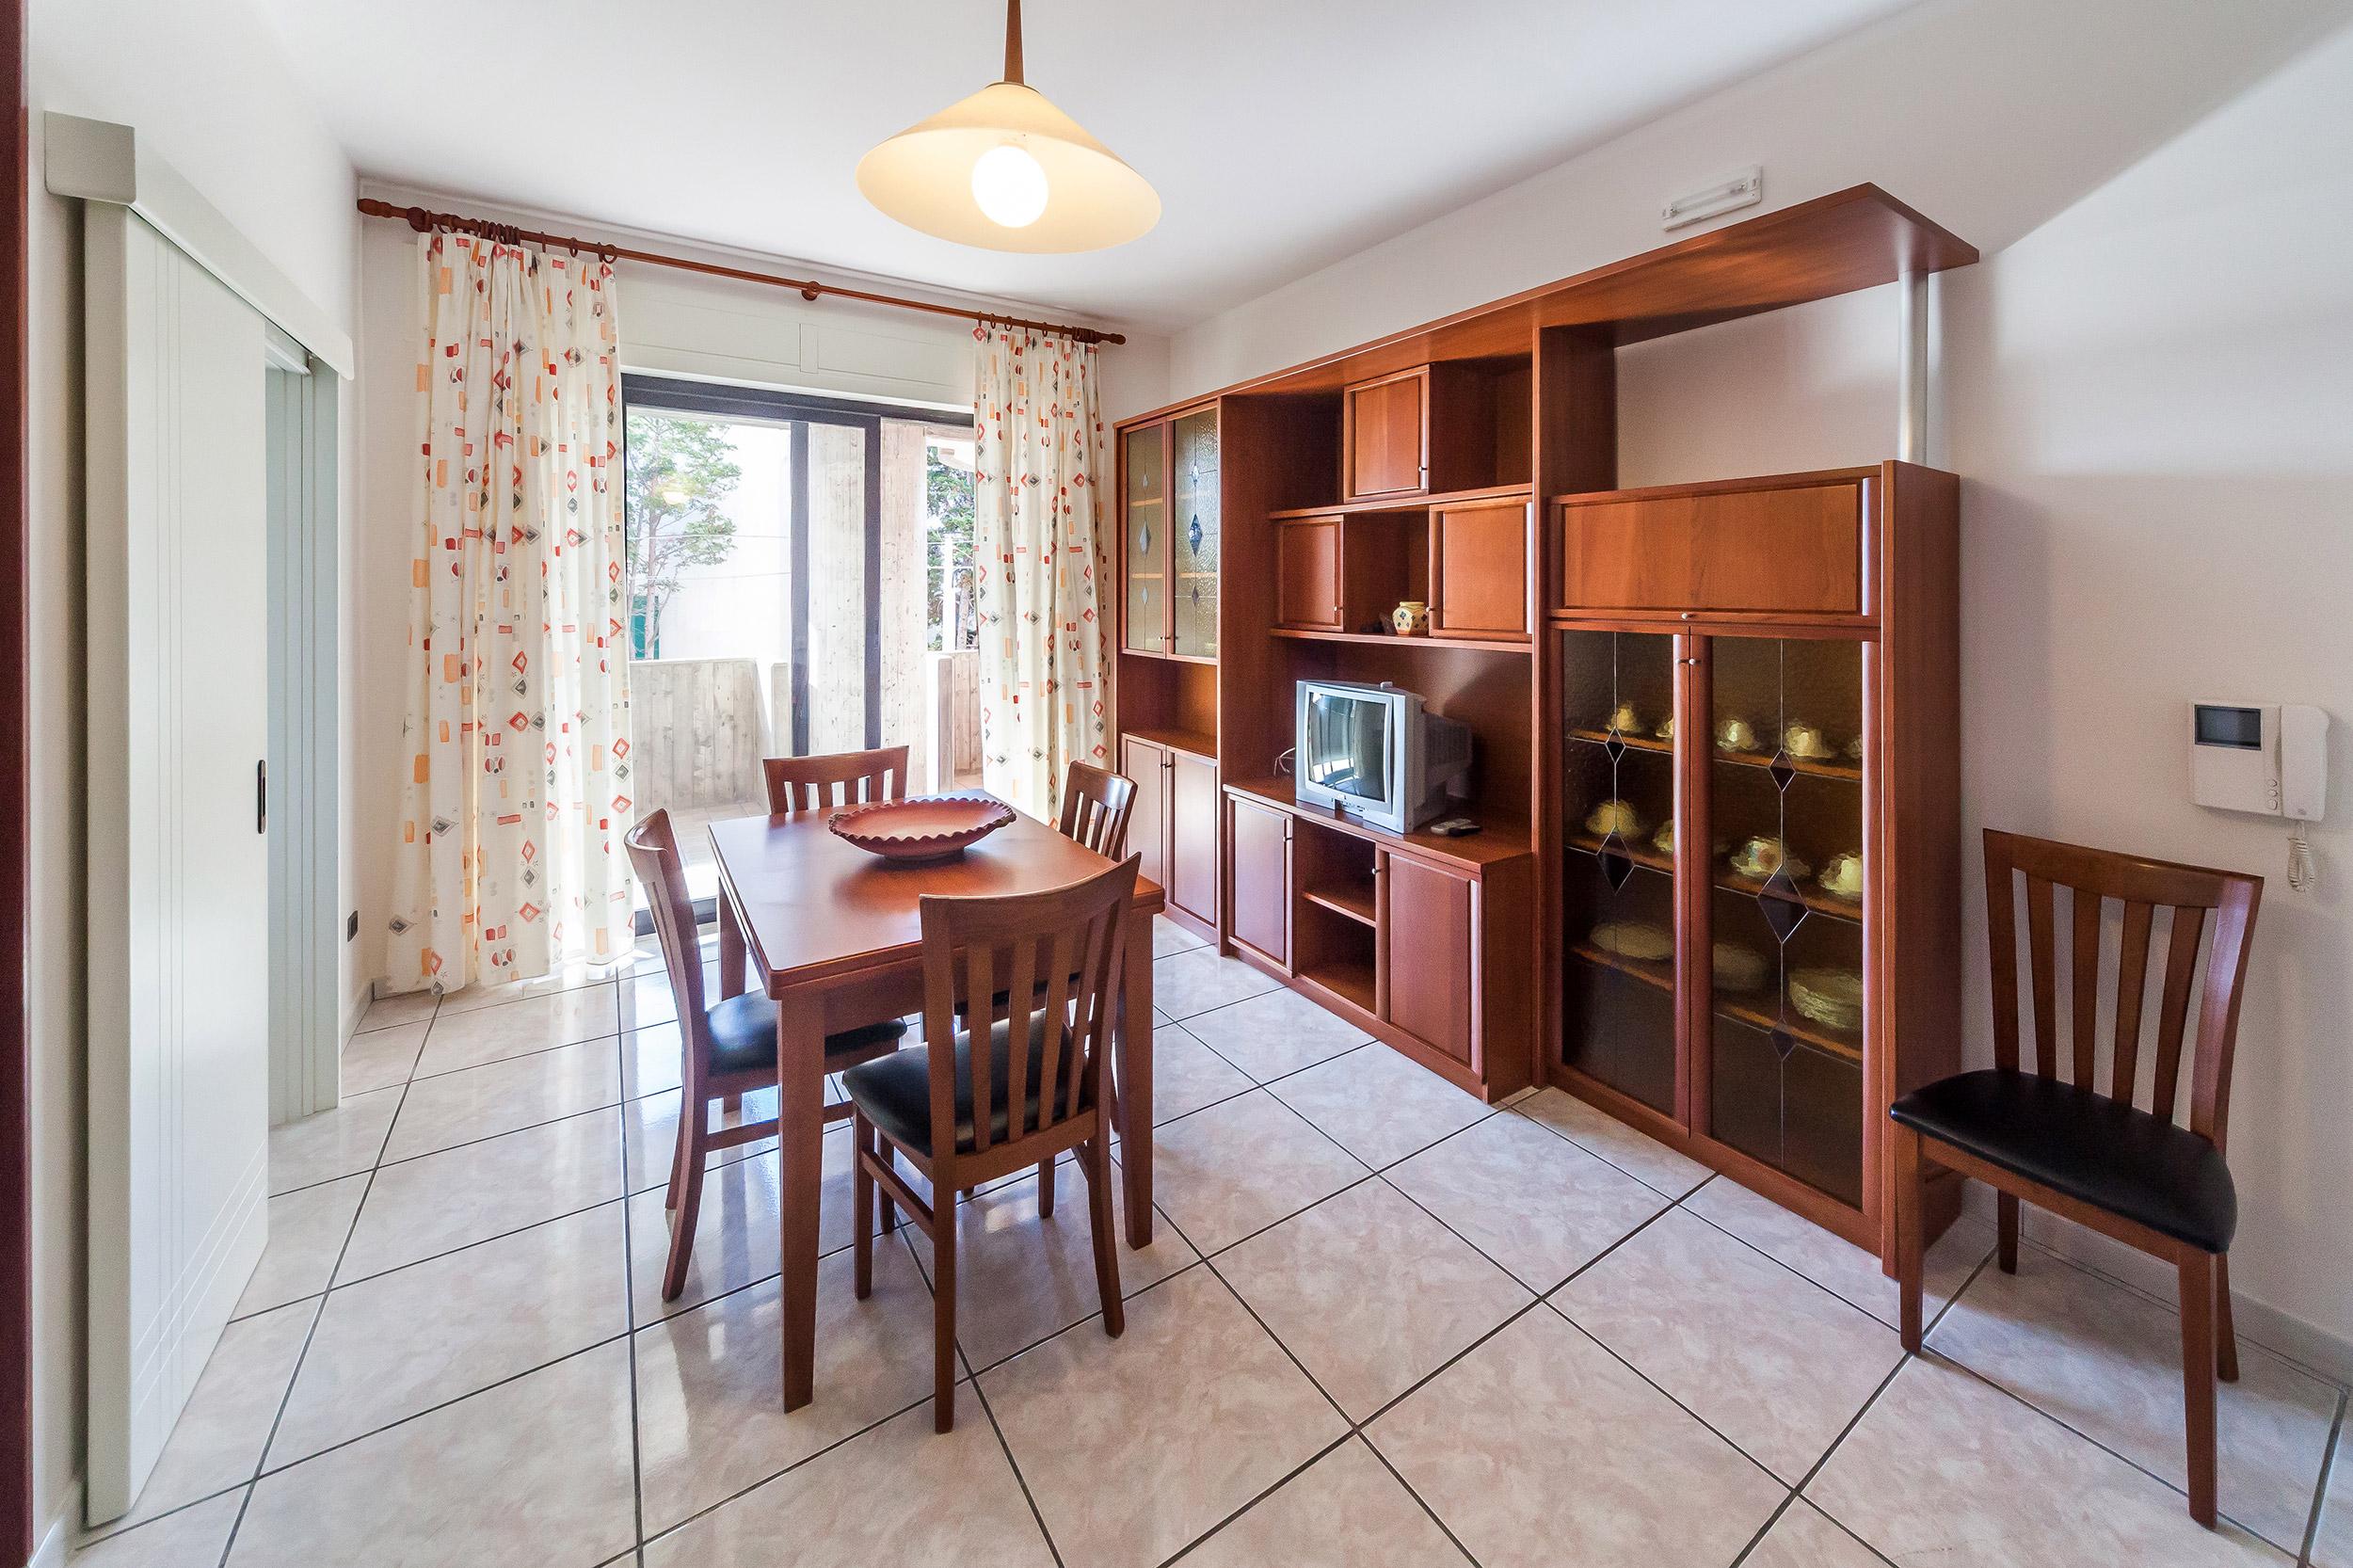 Ferienwohnung Appartamento vista mare a Gallipoli 4/6 posti - Baia Blu Side (2574458), Gallipoli, Lecce, Apulien, Italien, Bild 6